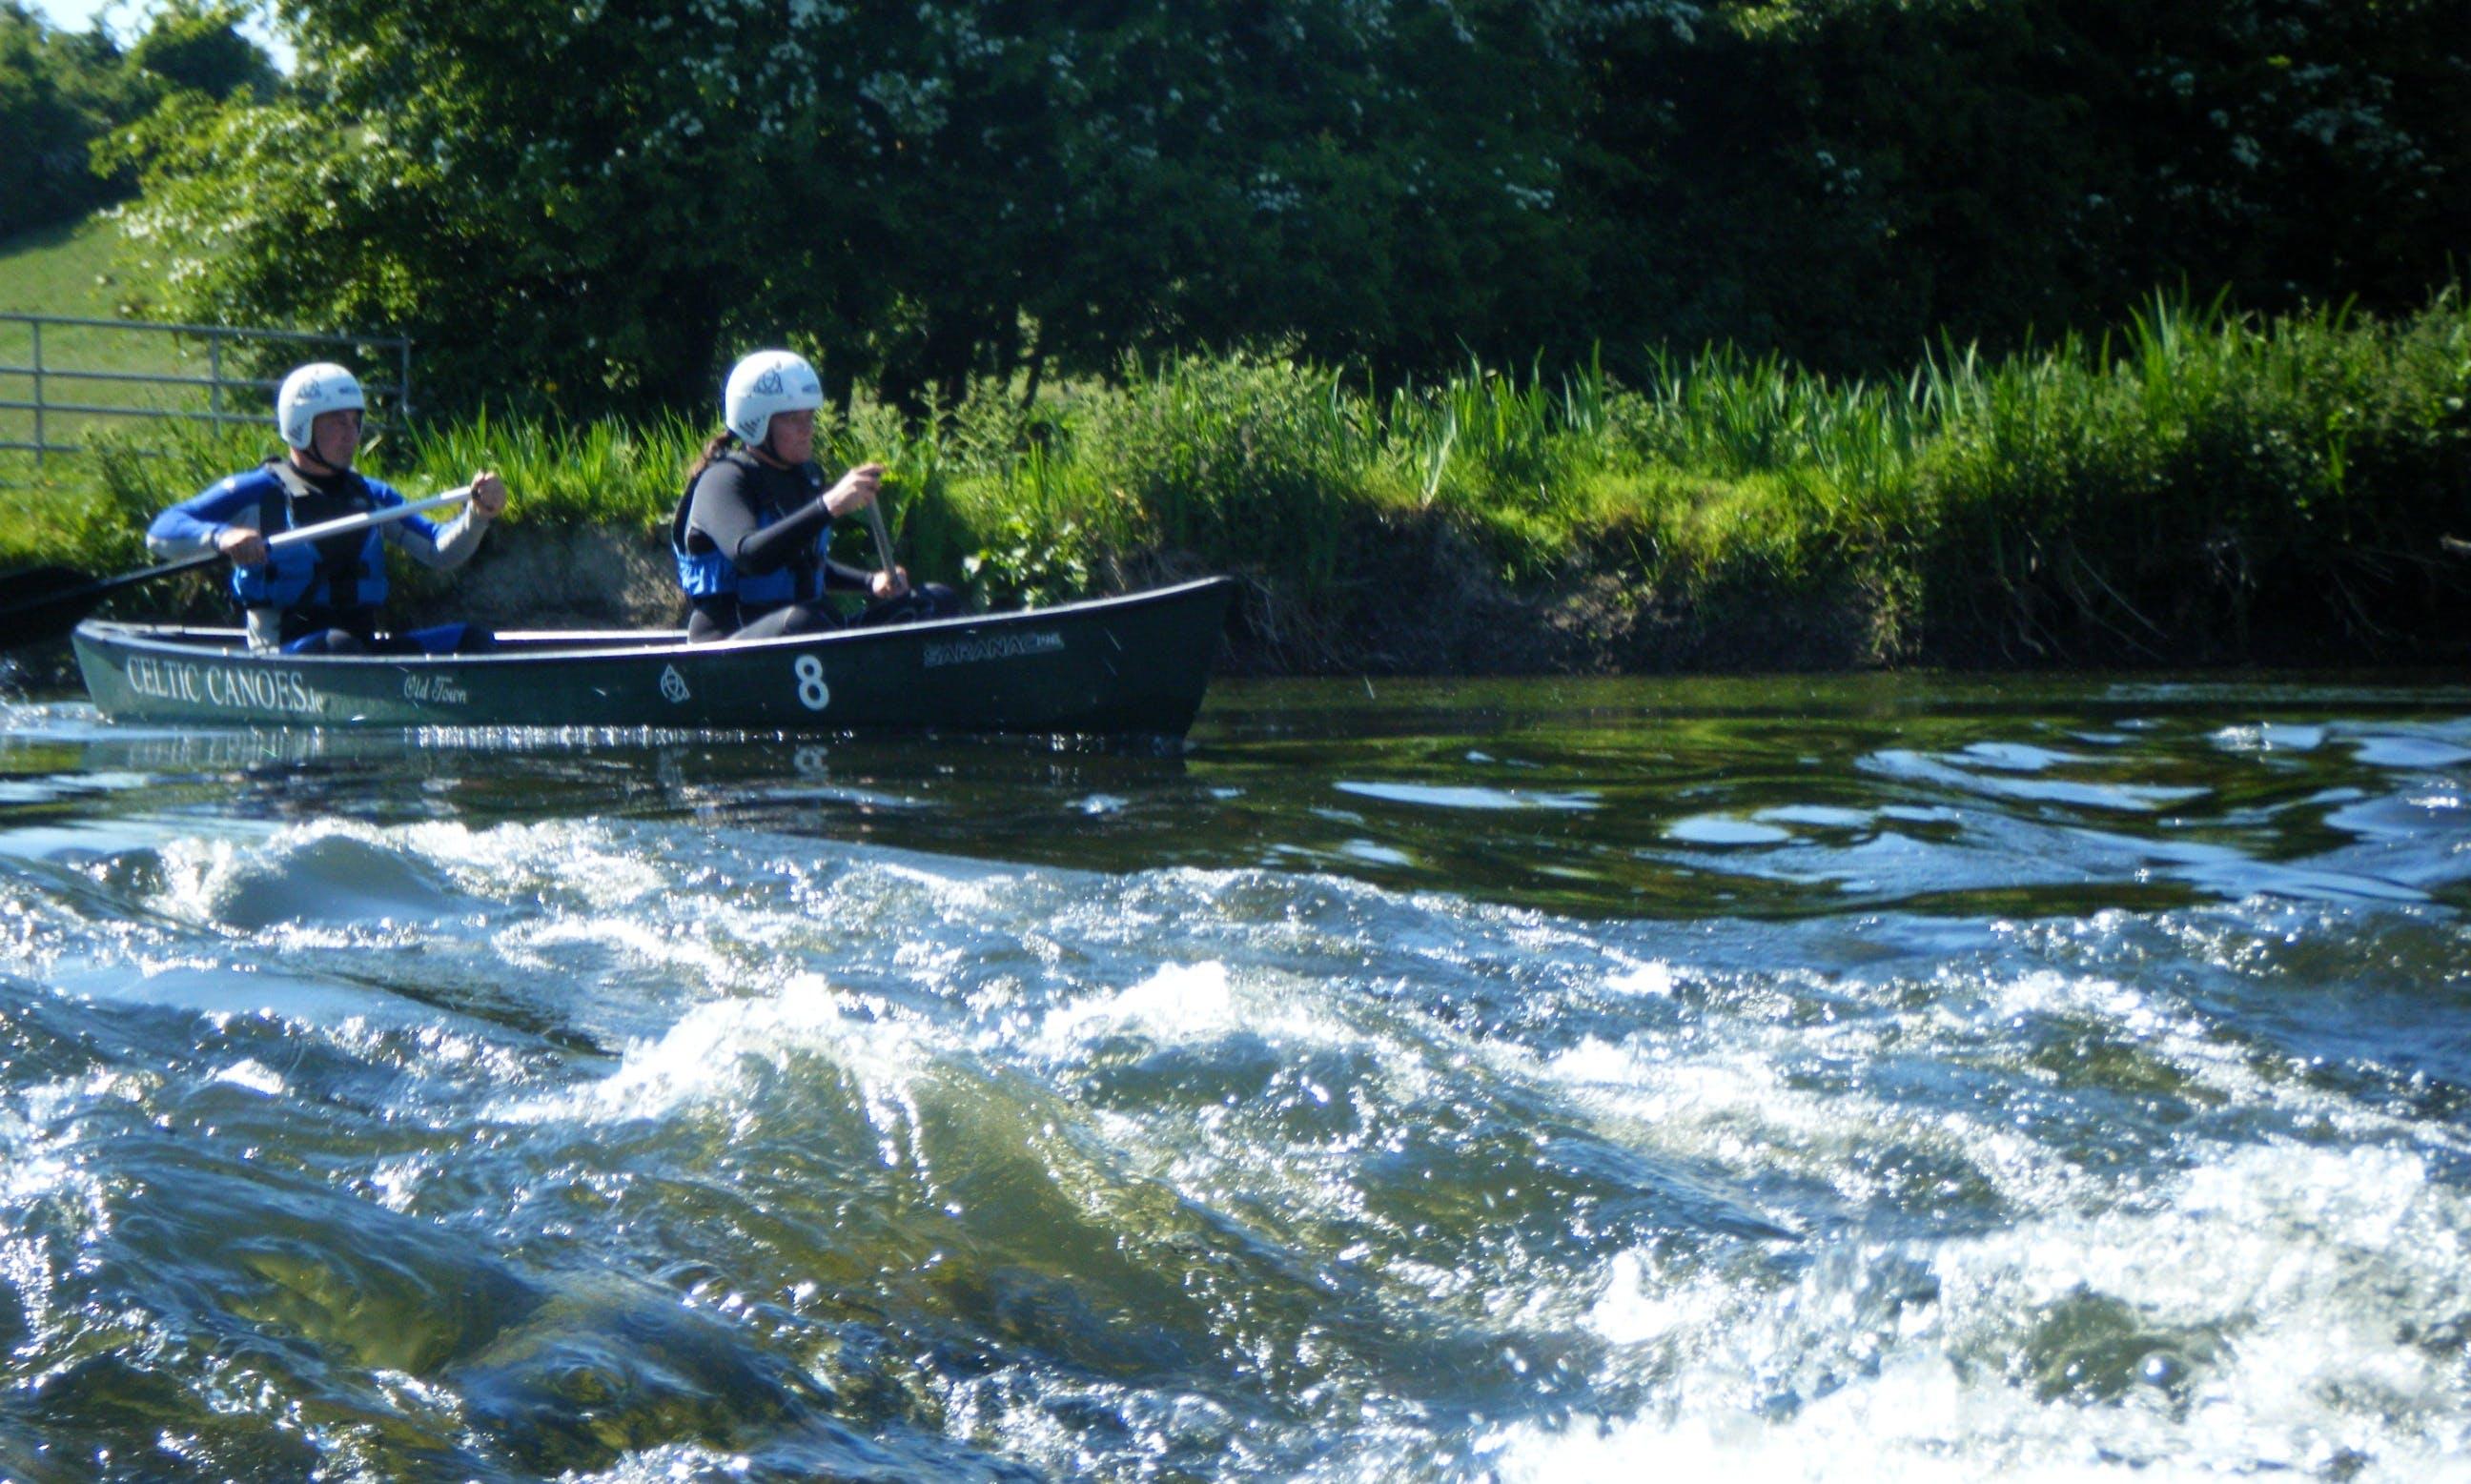 Amazing Canoe Trip in Geashill, Ireland